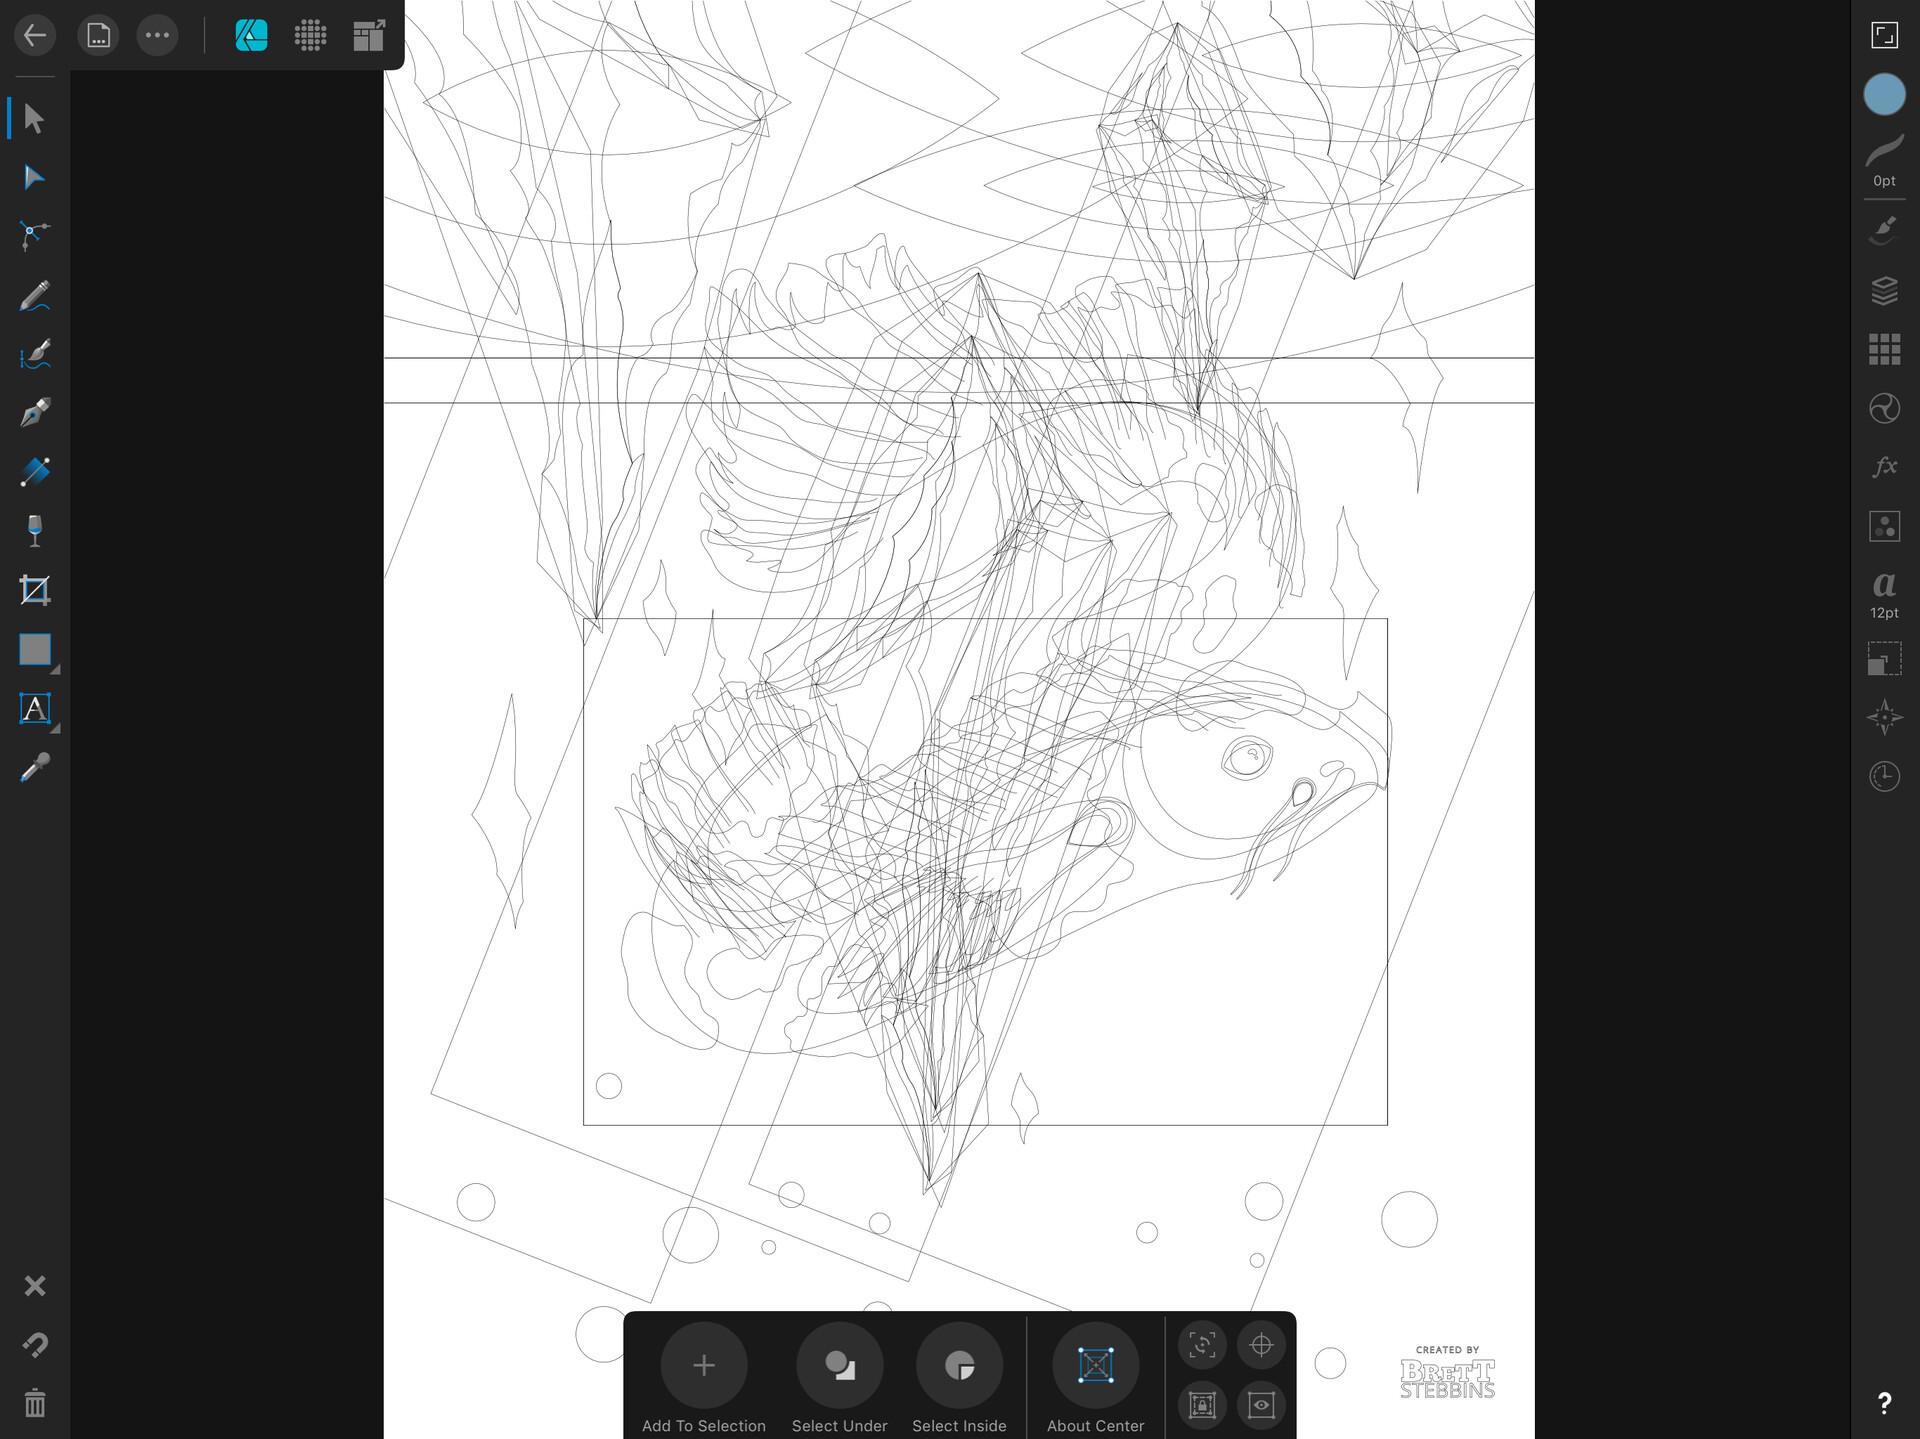 Brett stebbins koi eel 01 screenshot 02